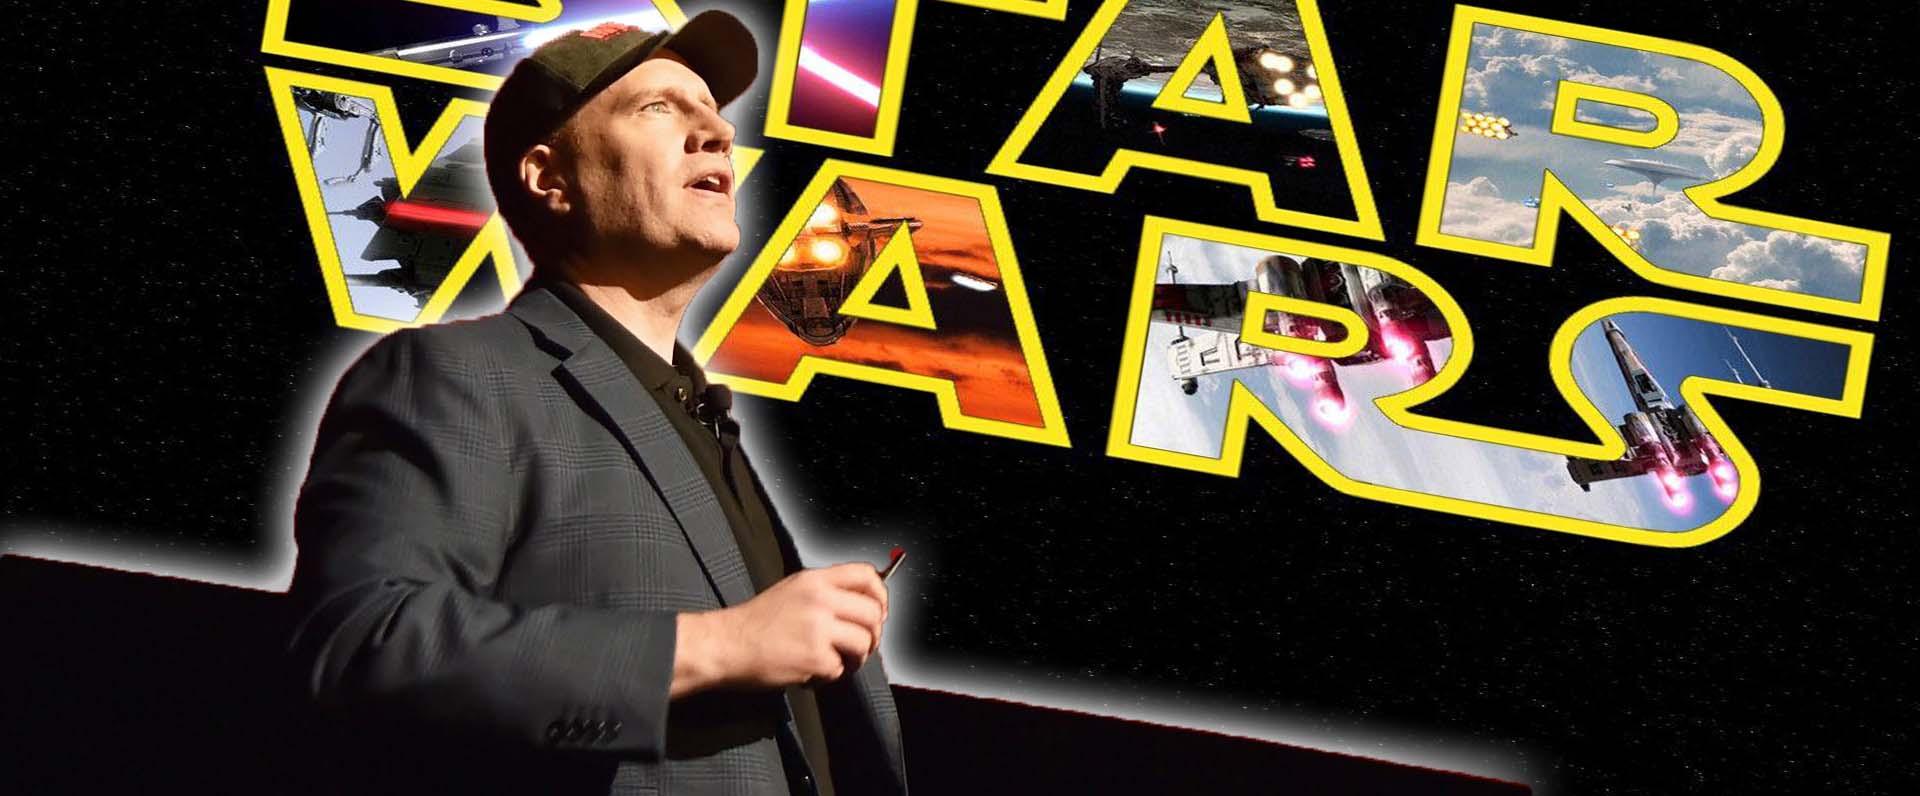 Kevin Feige, Star Wars